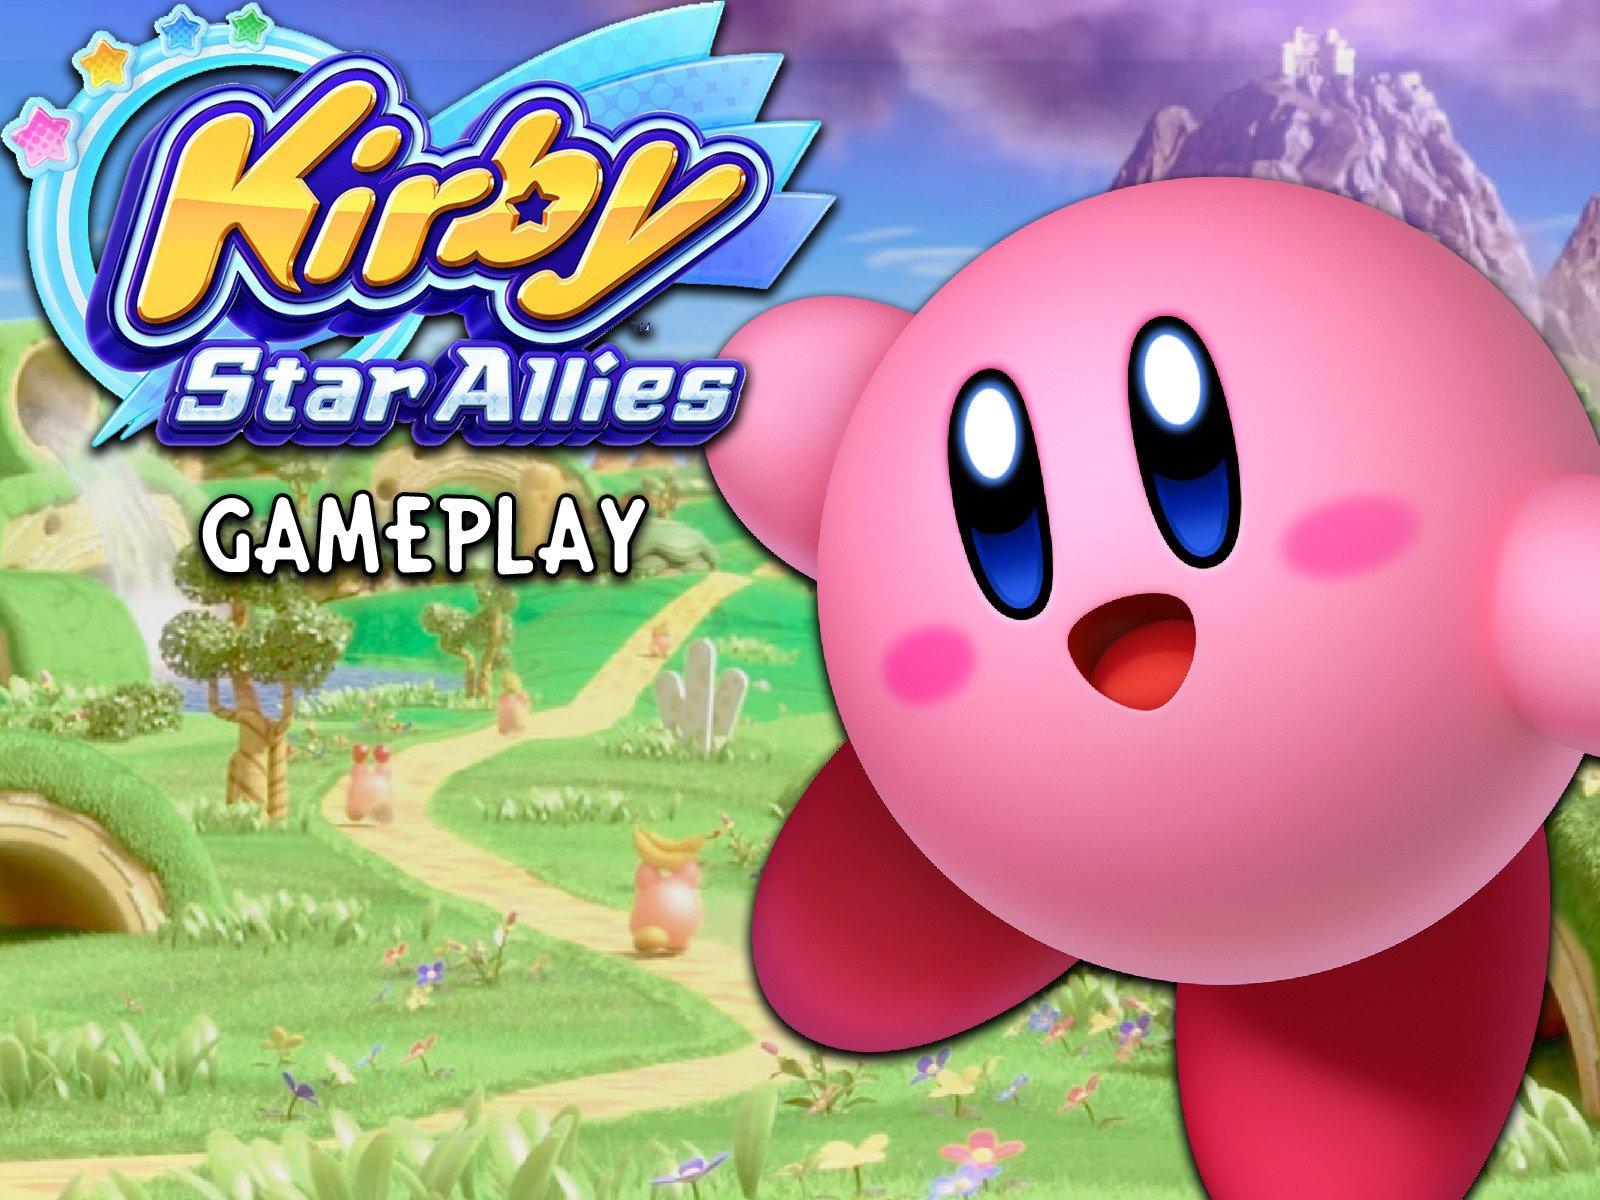 Kirby Star Allies Gameplay - Season 1